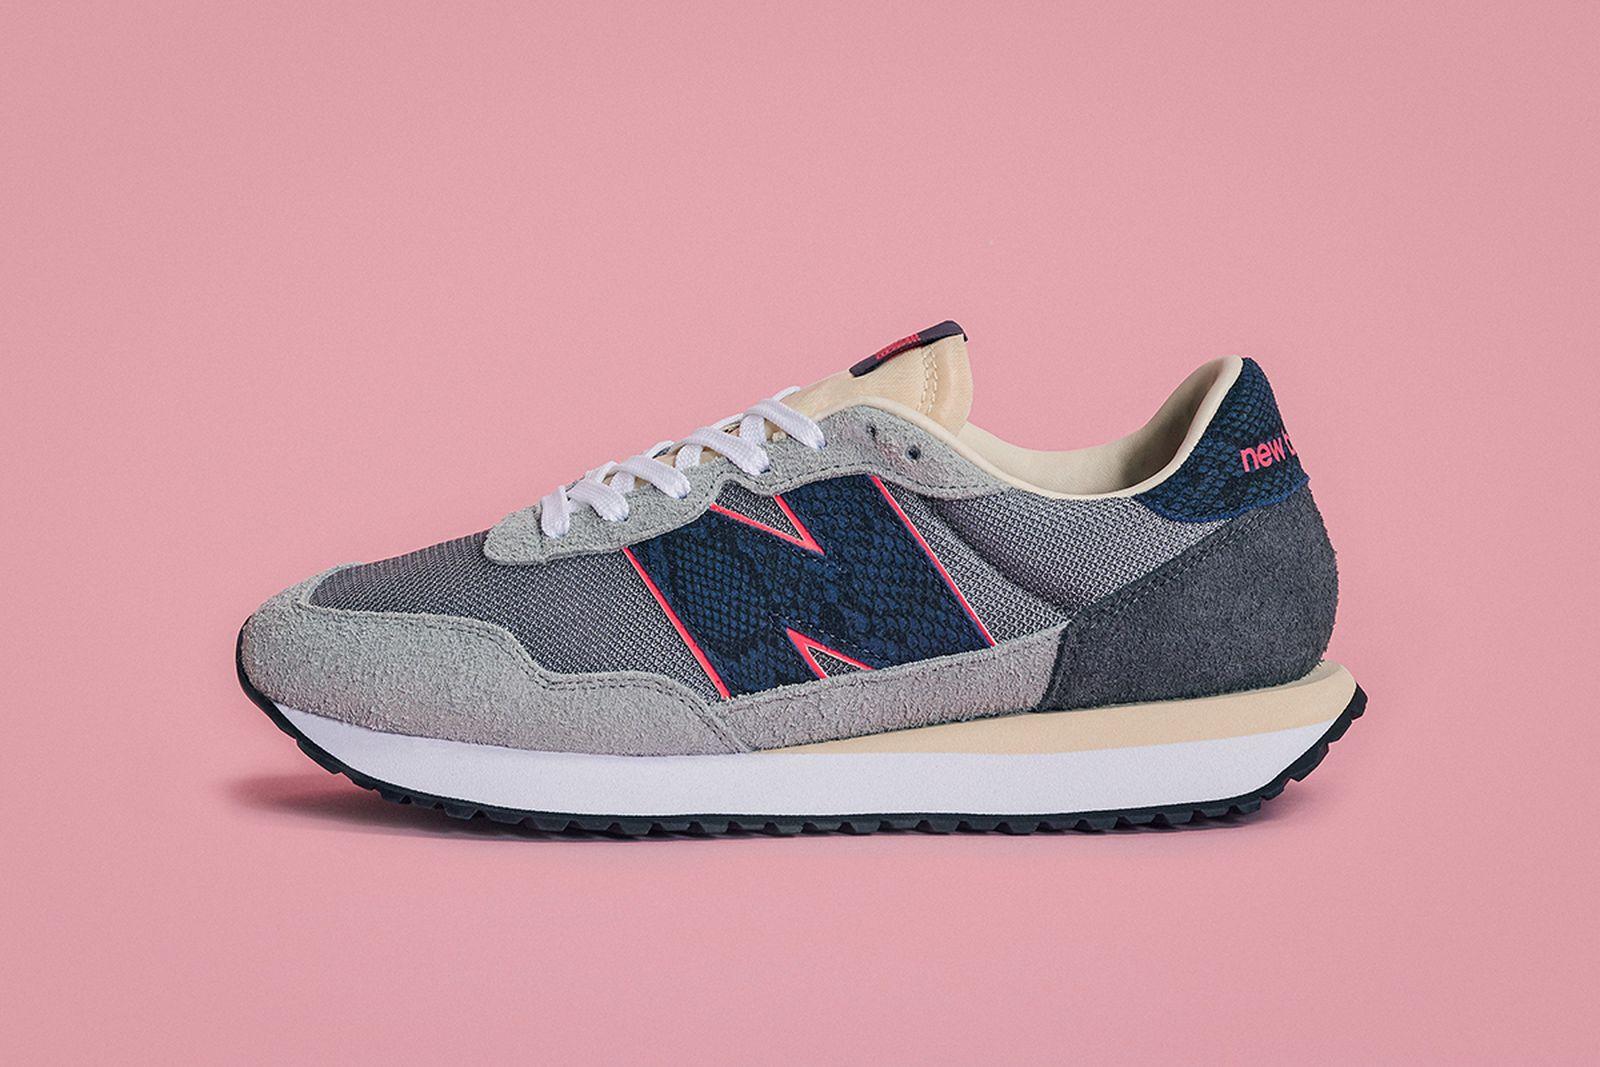 sneakersnstuff-new-balance-237-release-date-price-07